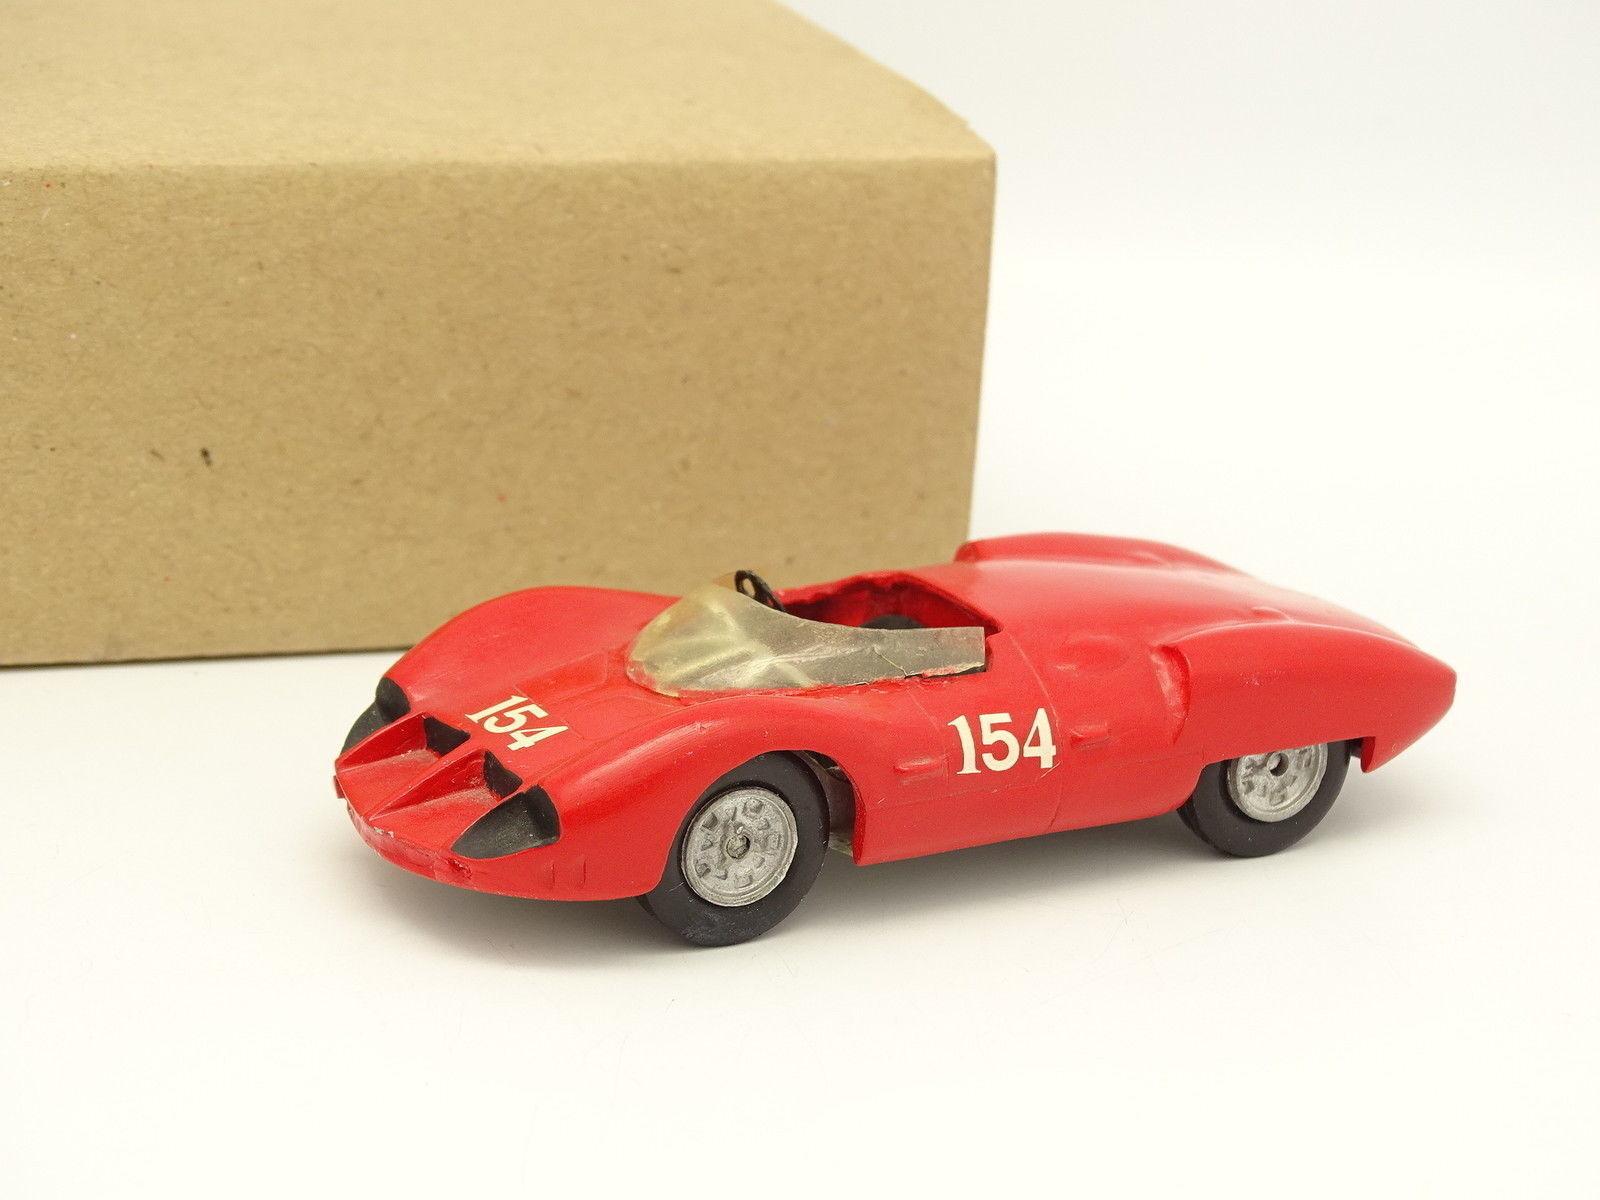 Kit Monté Métal 1 43 - Maserati Tipo 64 Targa Florio 1962 - n°154